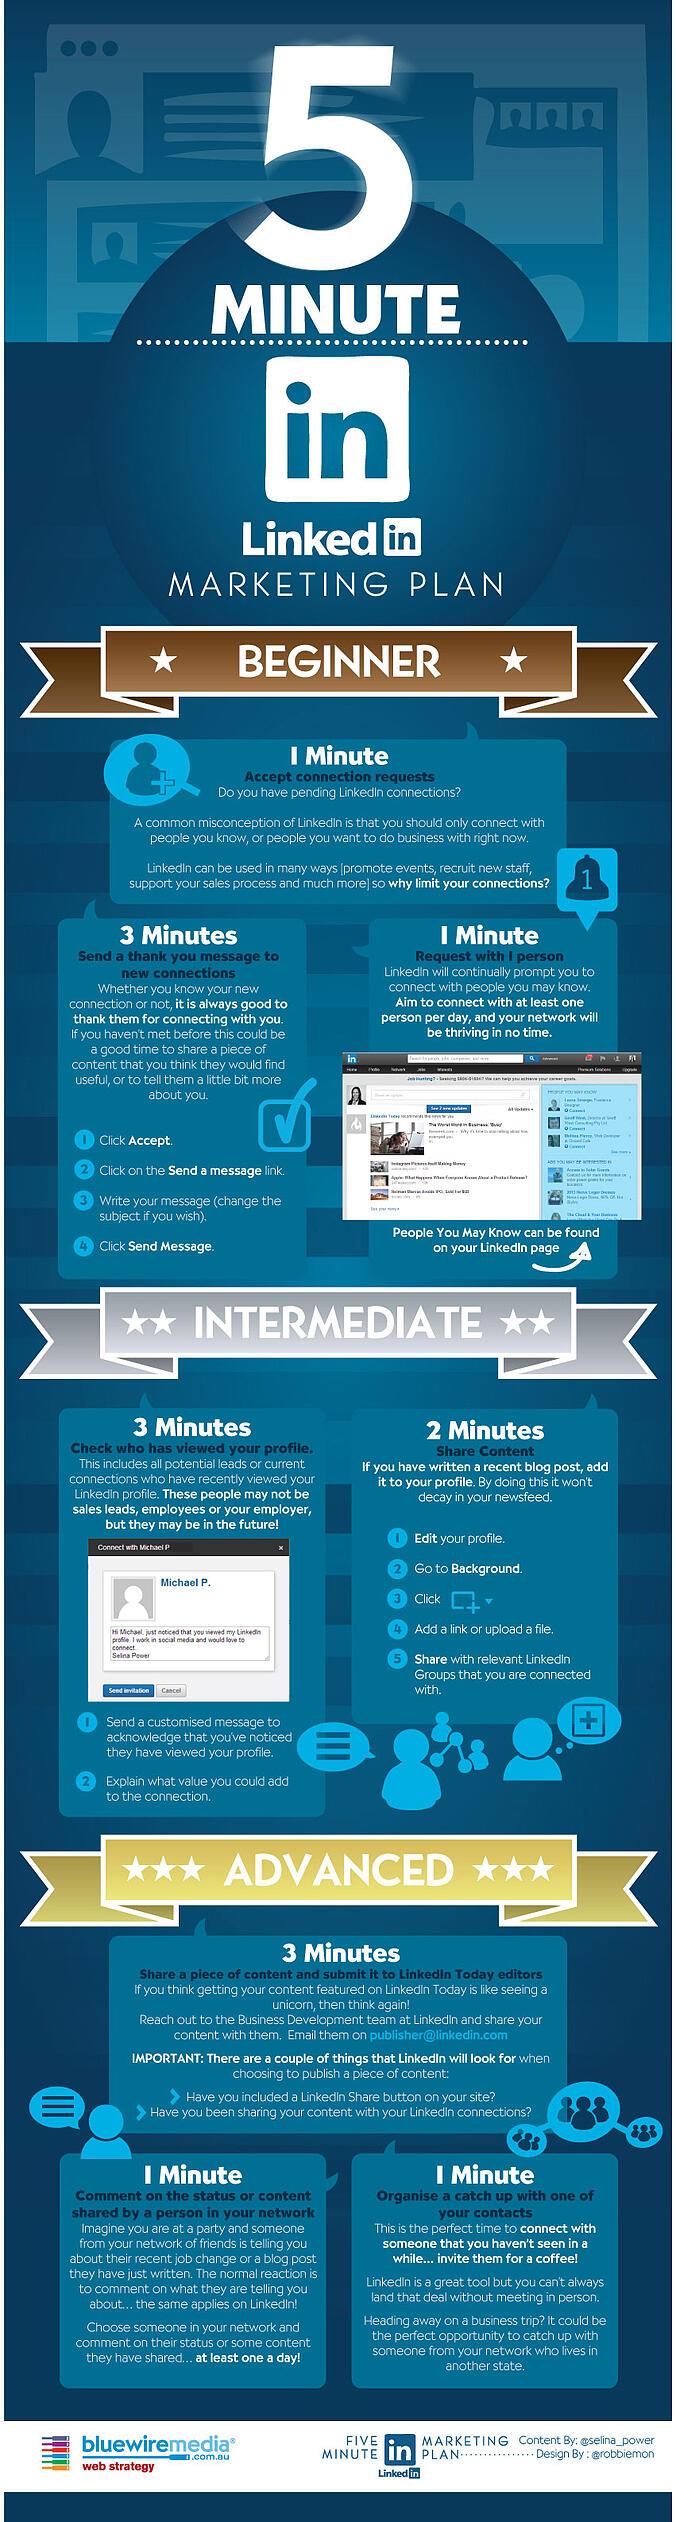 5min LinkedIn Marketing Plan Infographic